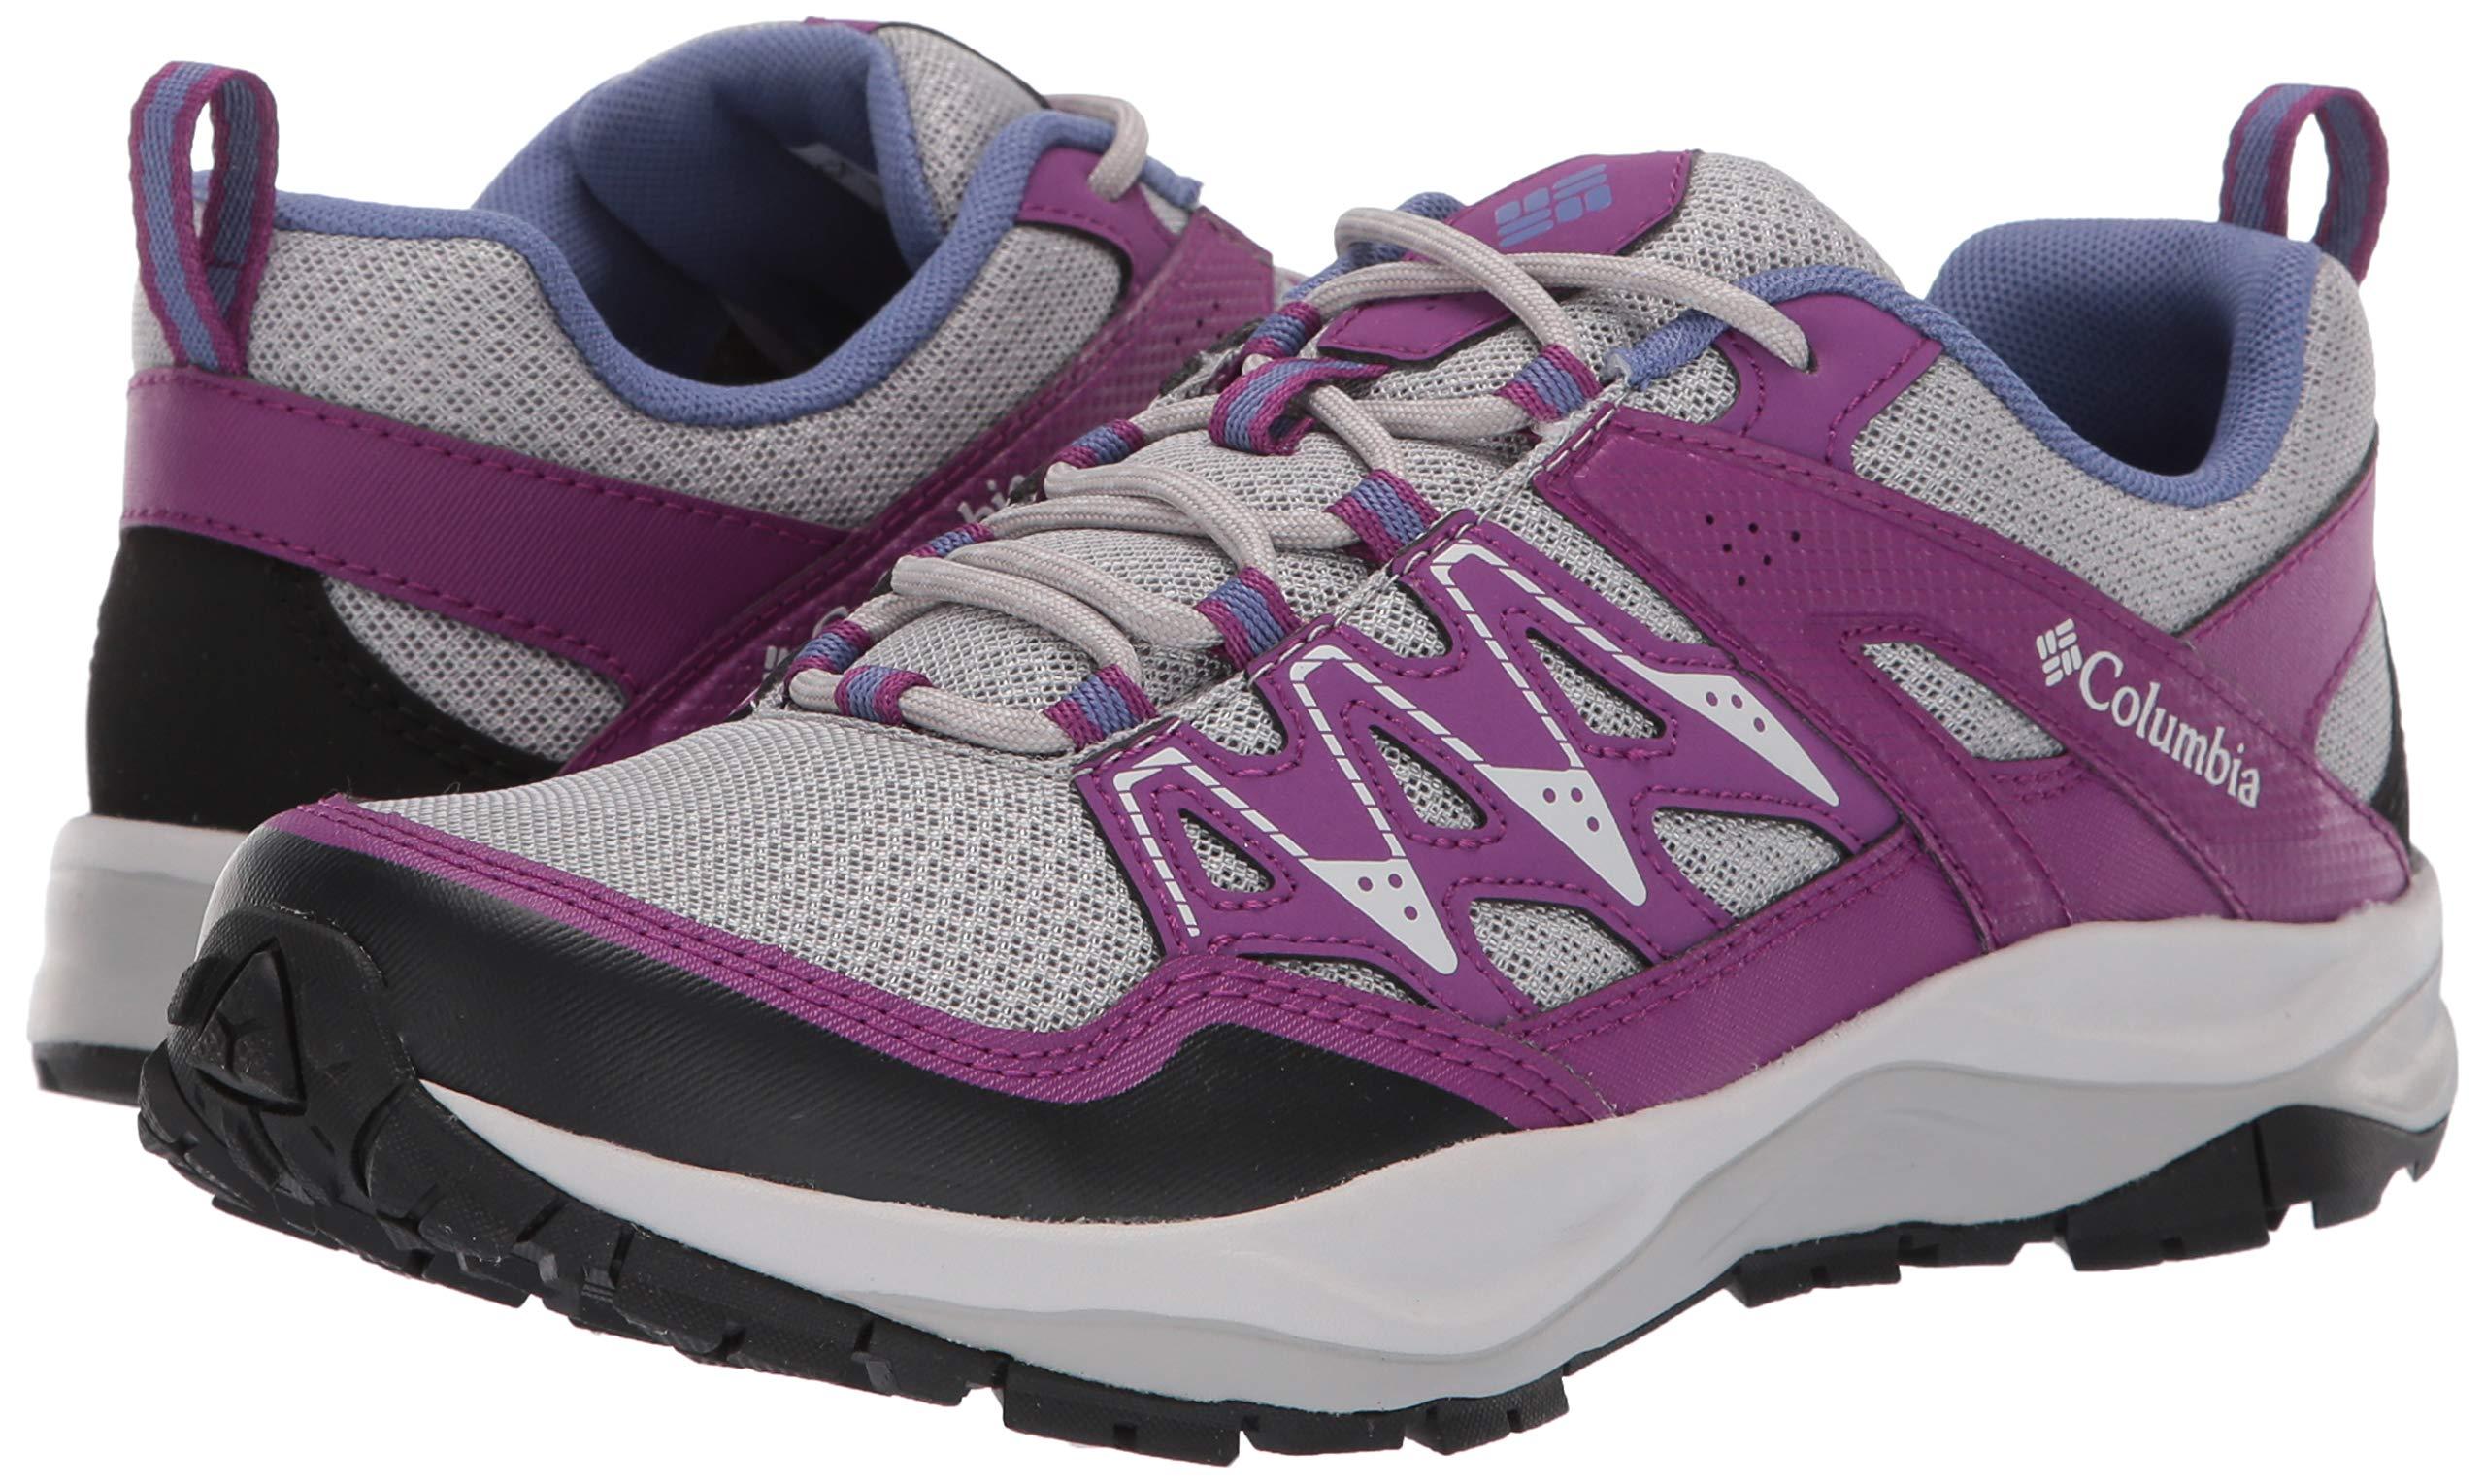 81cU0O4h3EL - Columbia Women's WAYFINDER Hiking Shoes